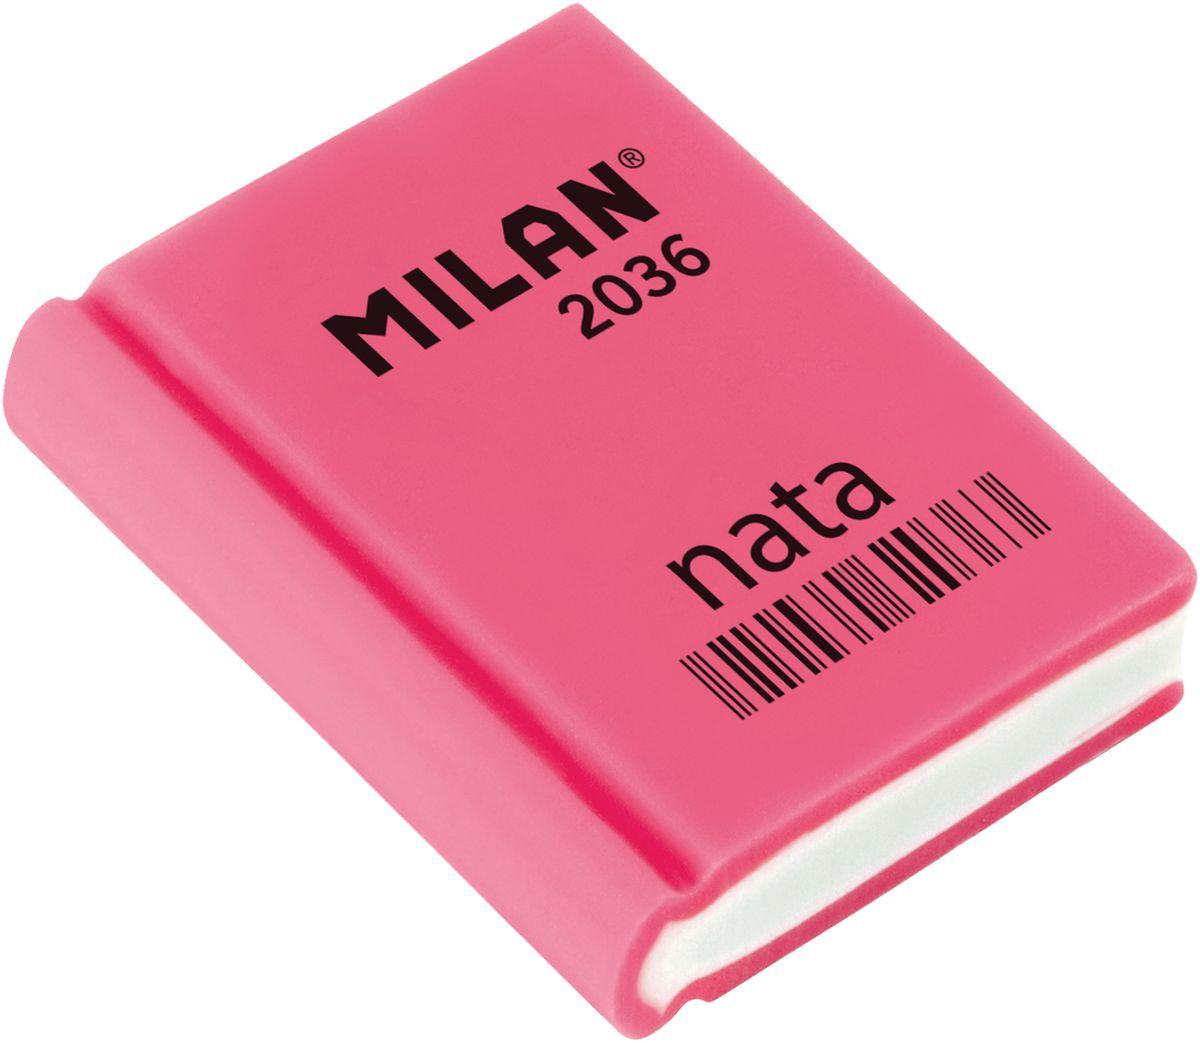 Milan Ластик Nata 2036 прямоугольный цвет розовый лодочный мотор 2 х тактный titan tp70aehdl